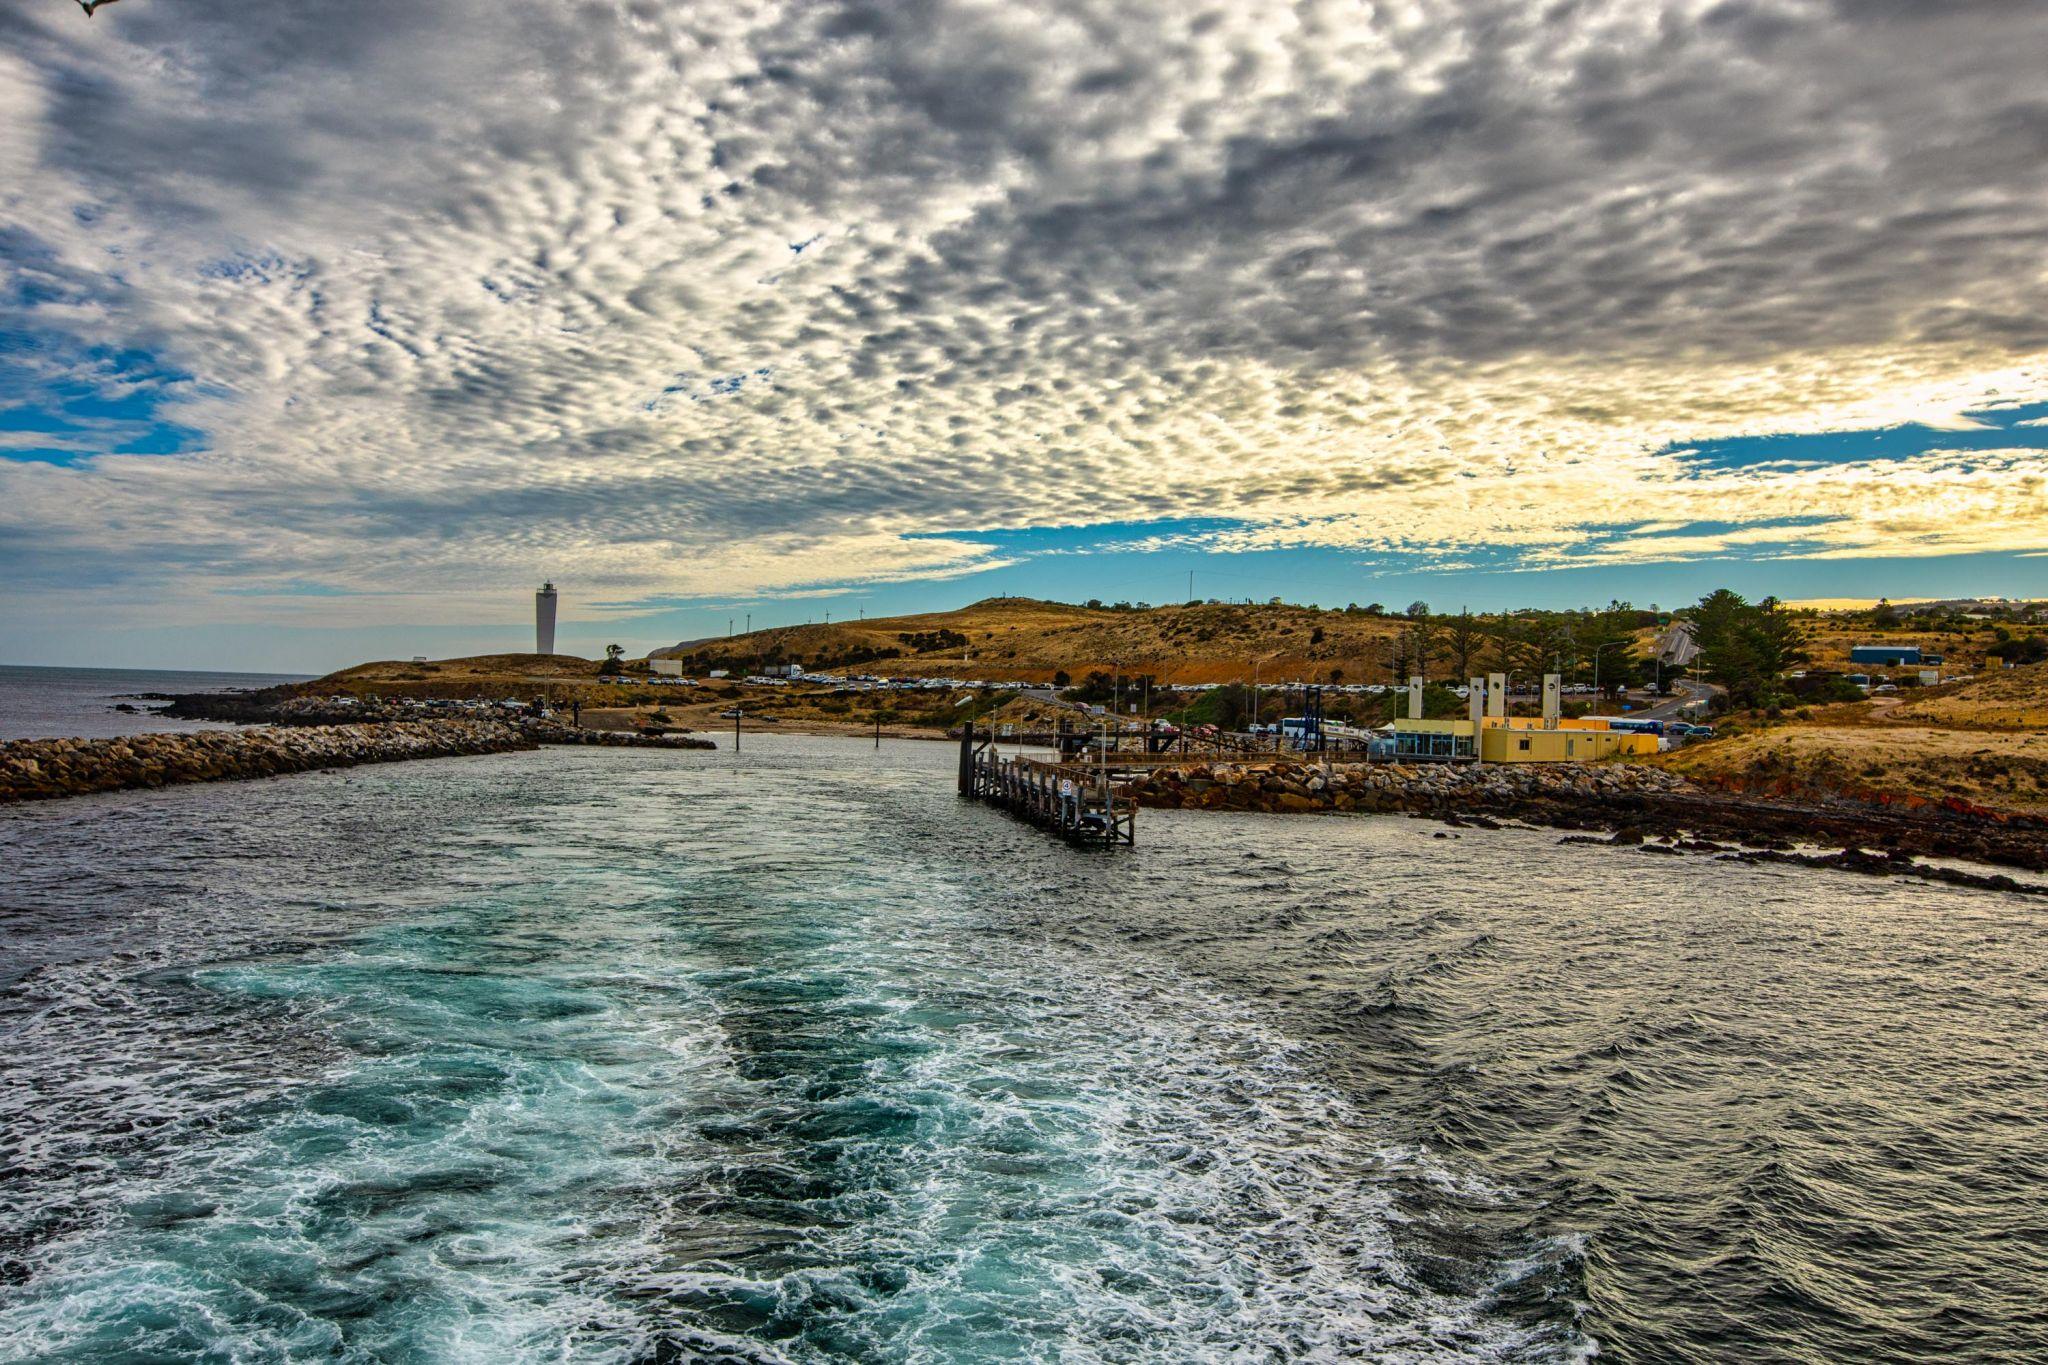 Ferry leaving Cape Jervis for Kangaroo Island, SA, Australia